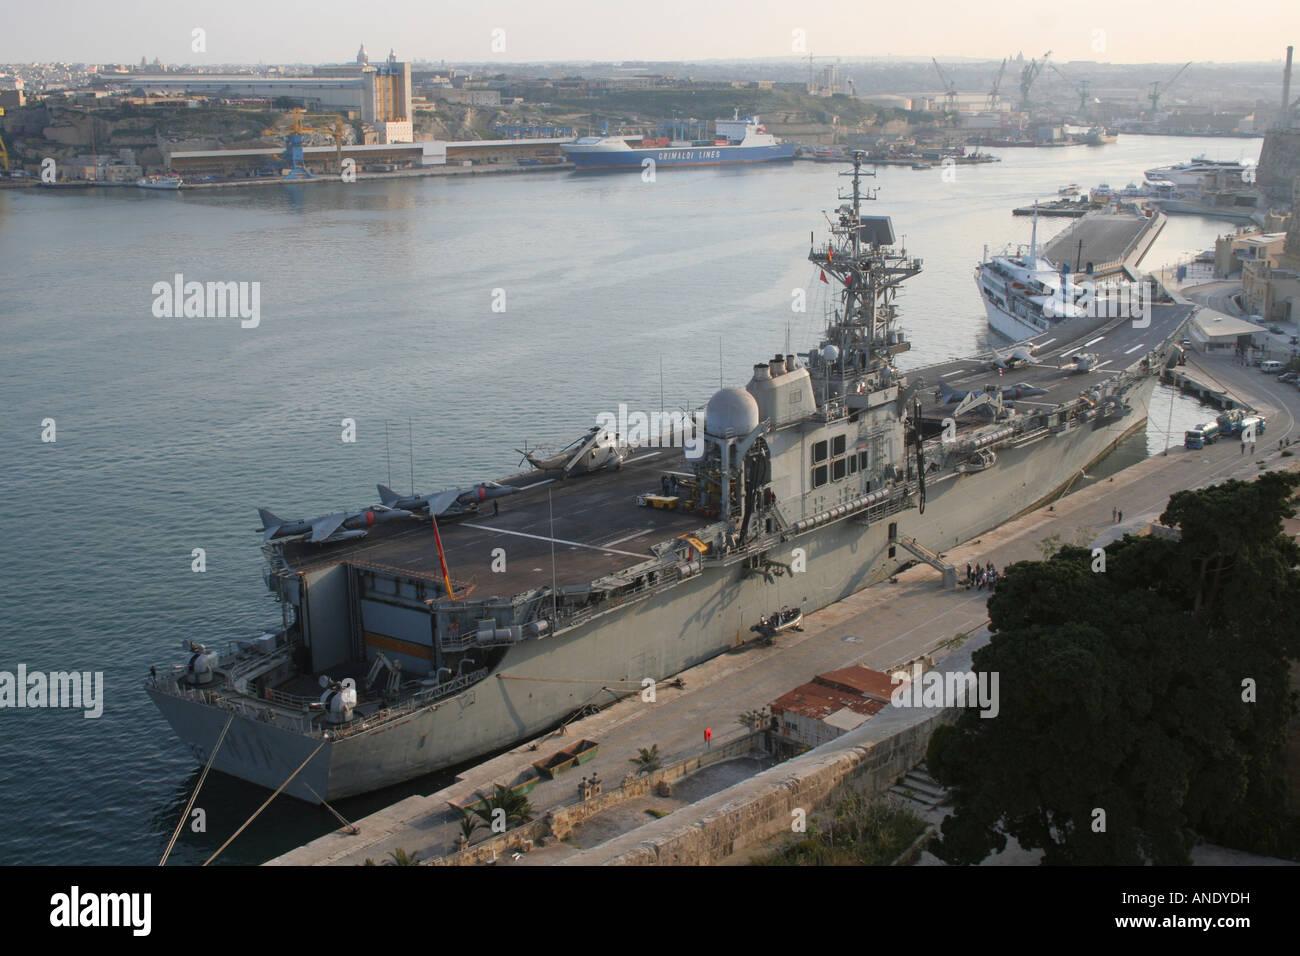 The Spanish Navy aircraft carrier Principe de Asturias in ... Spanish Aircraft Carrier News